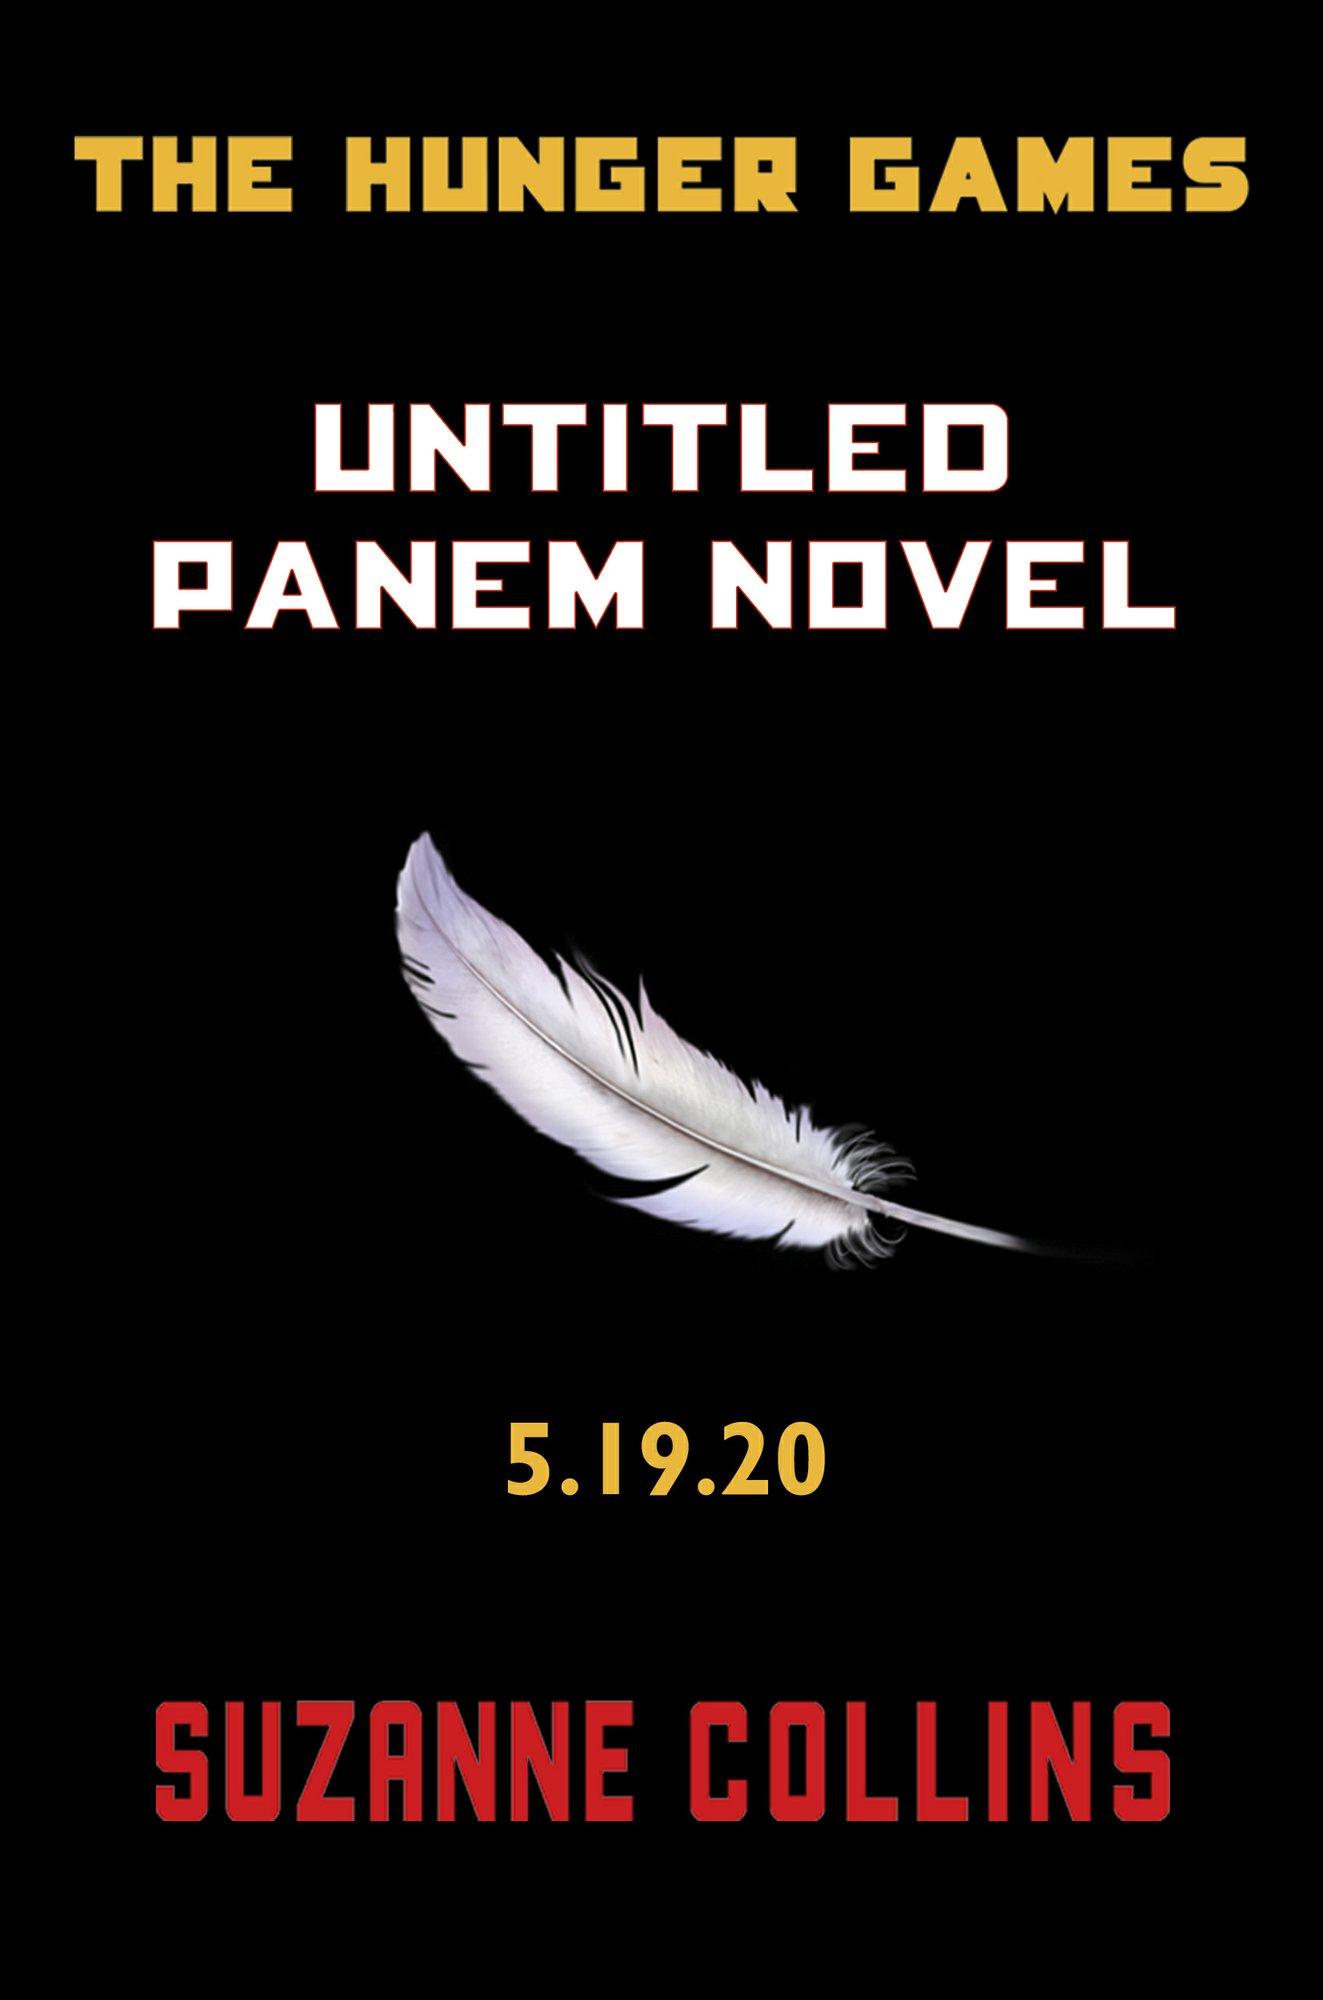 APNewsBreak: 'Hunger Games' prequel novel coming in 2020